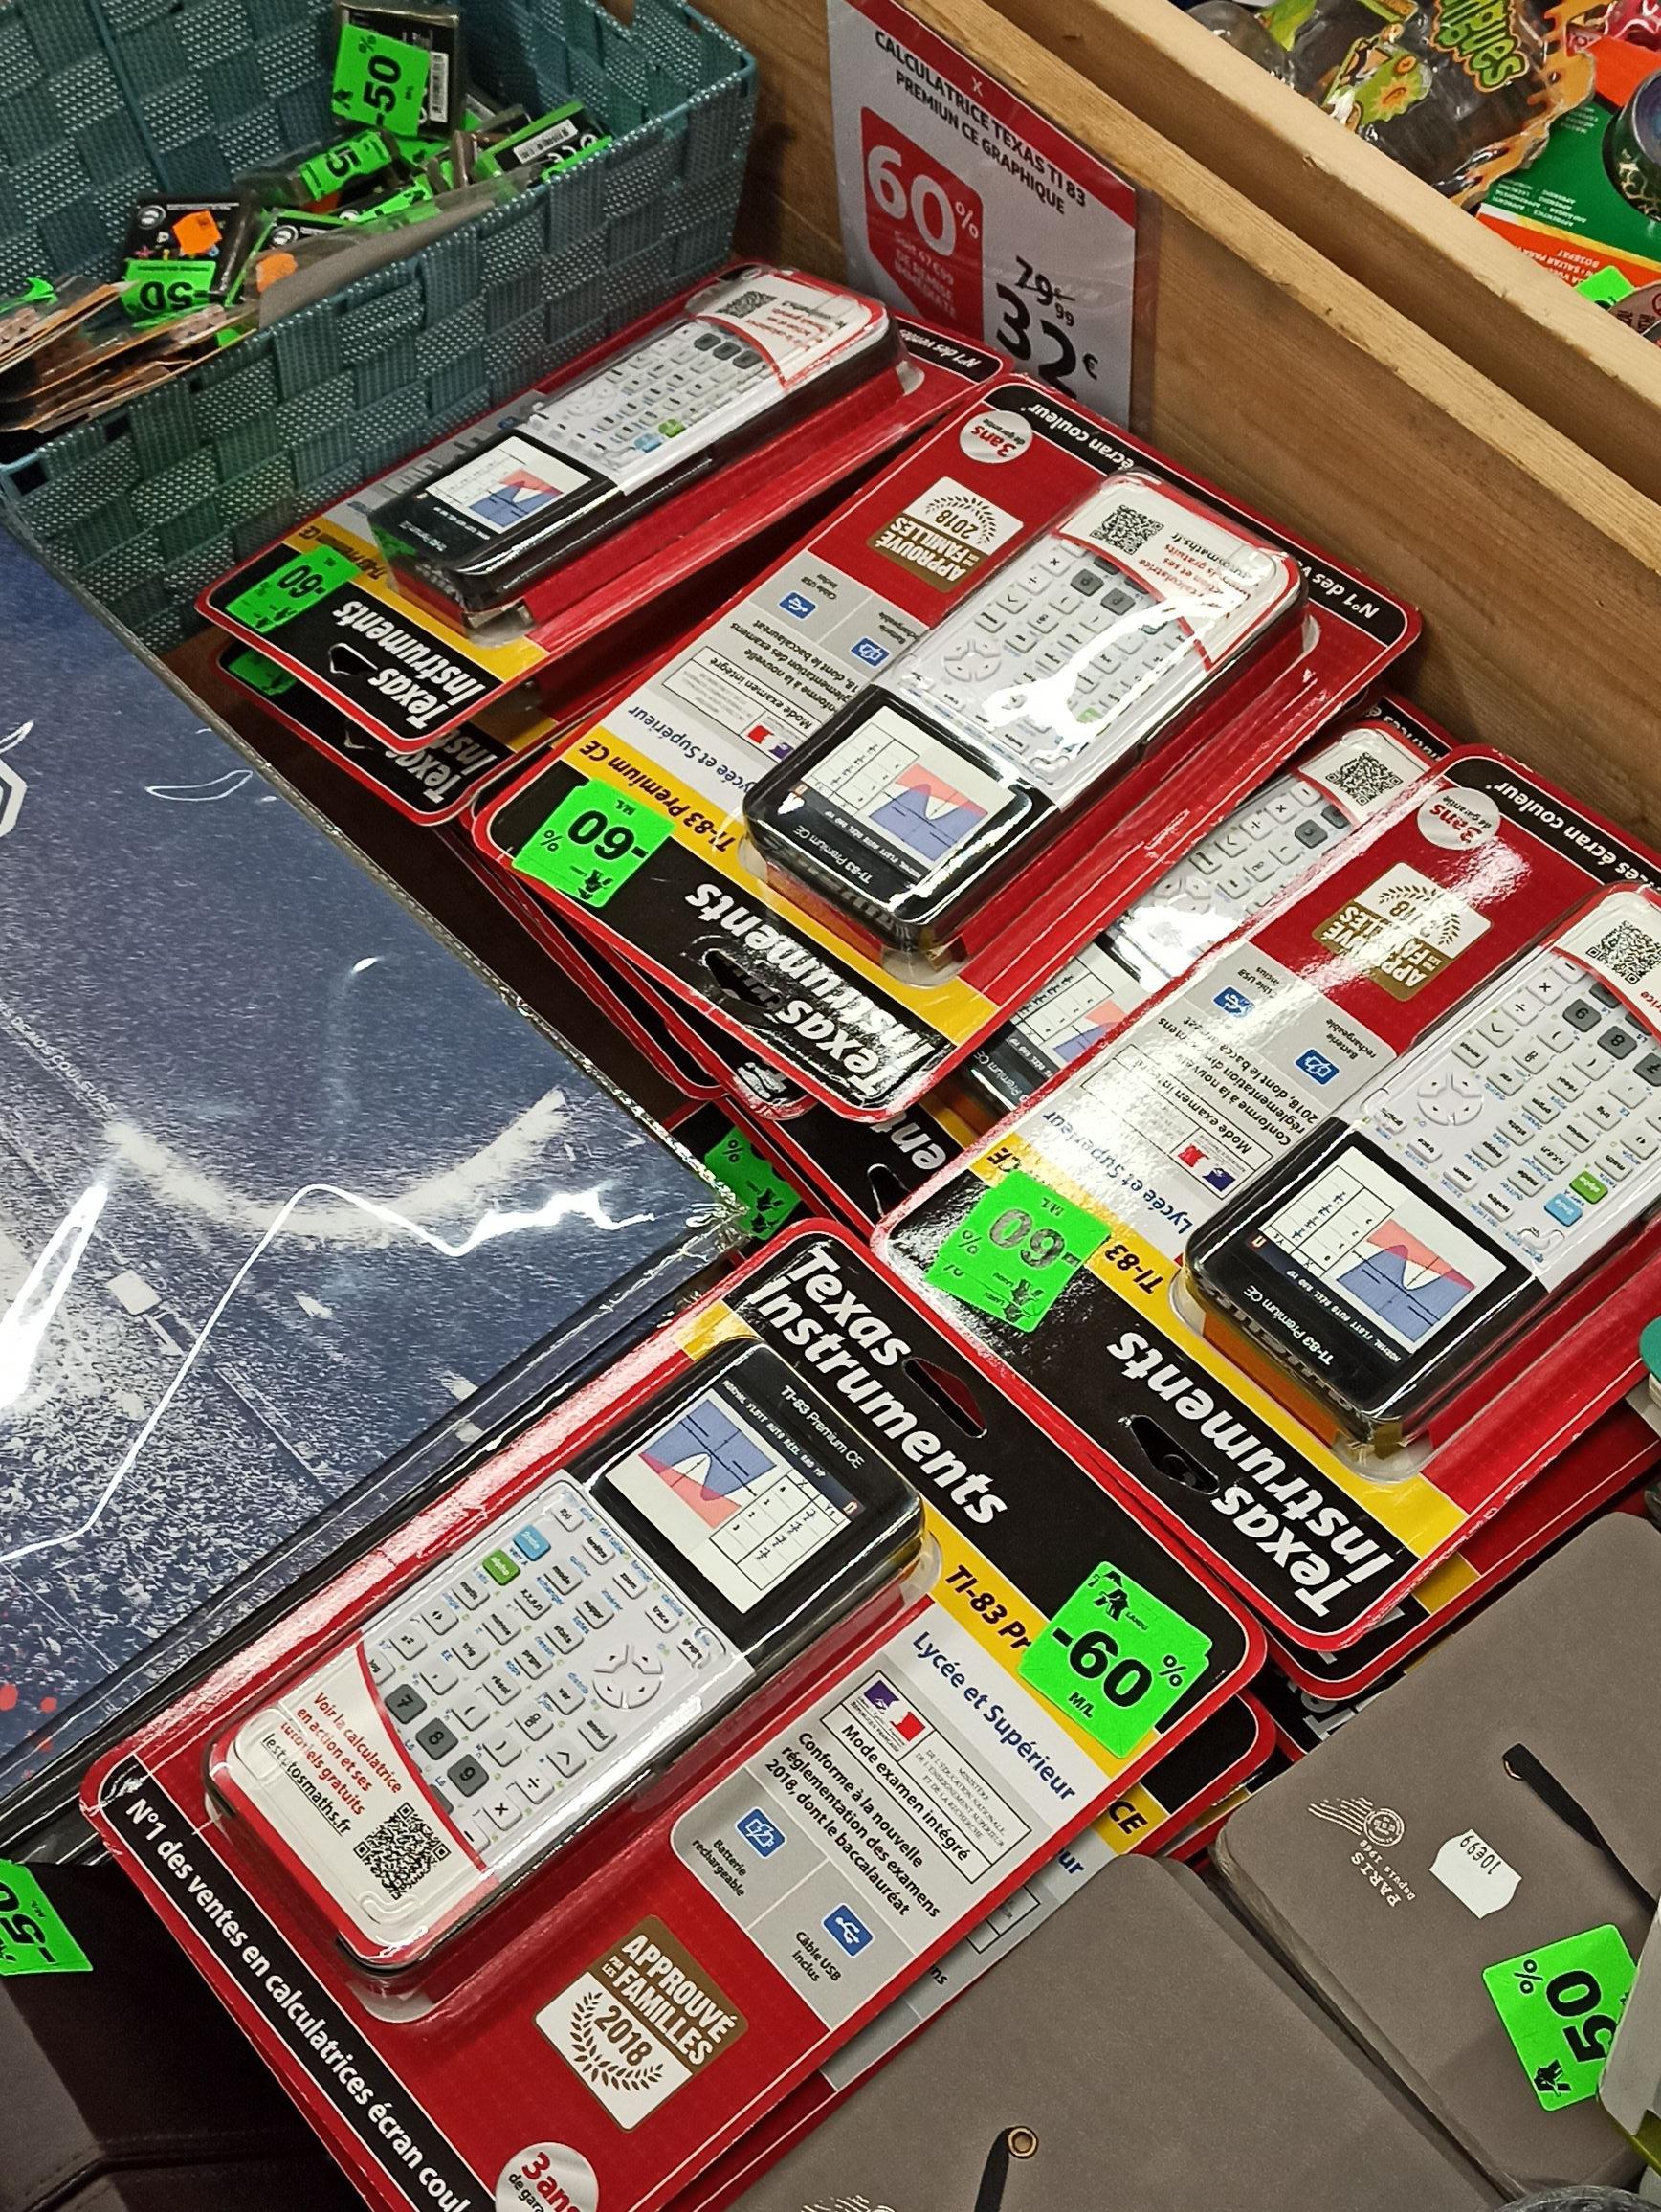 Calculatrice Texas Instruments Ti83 Premium - Nancy Laxou (54)